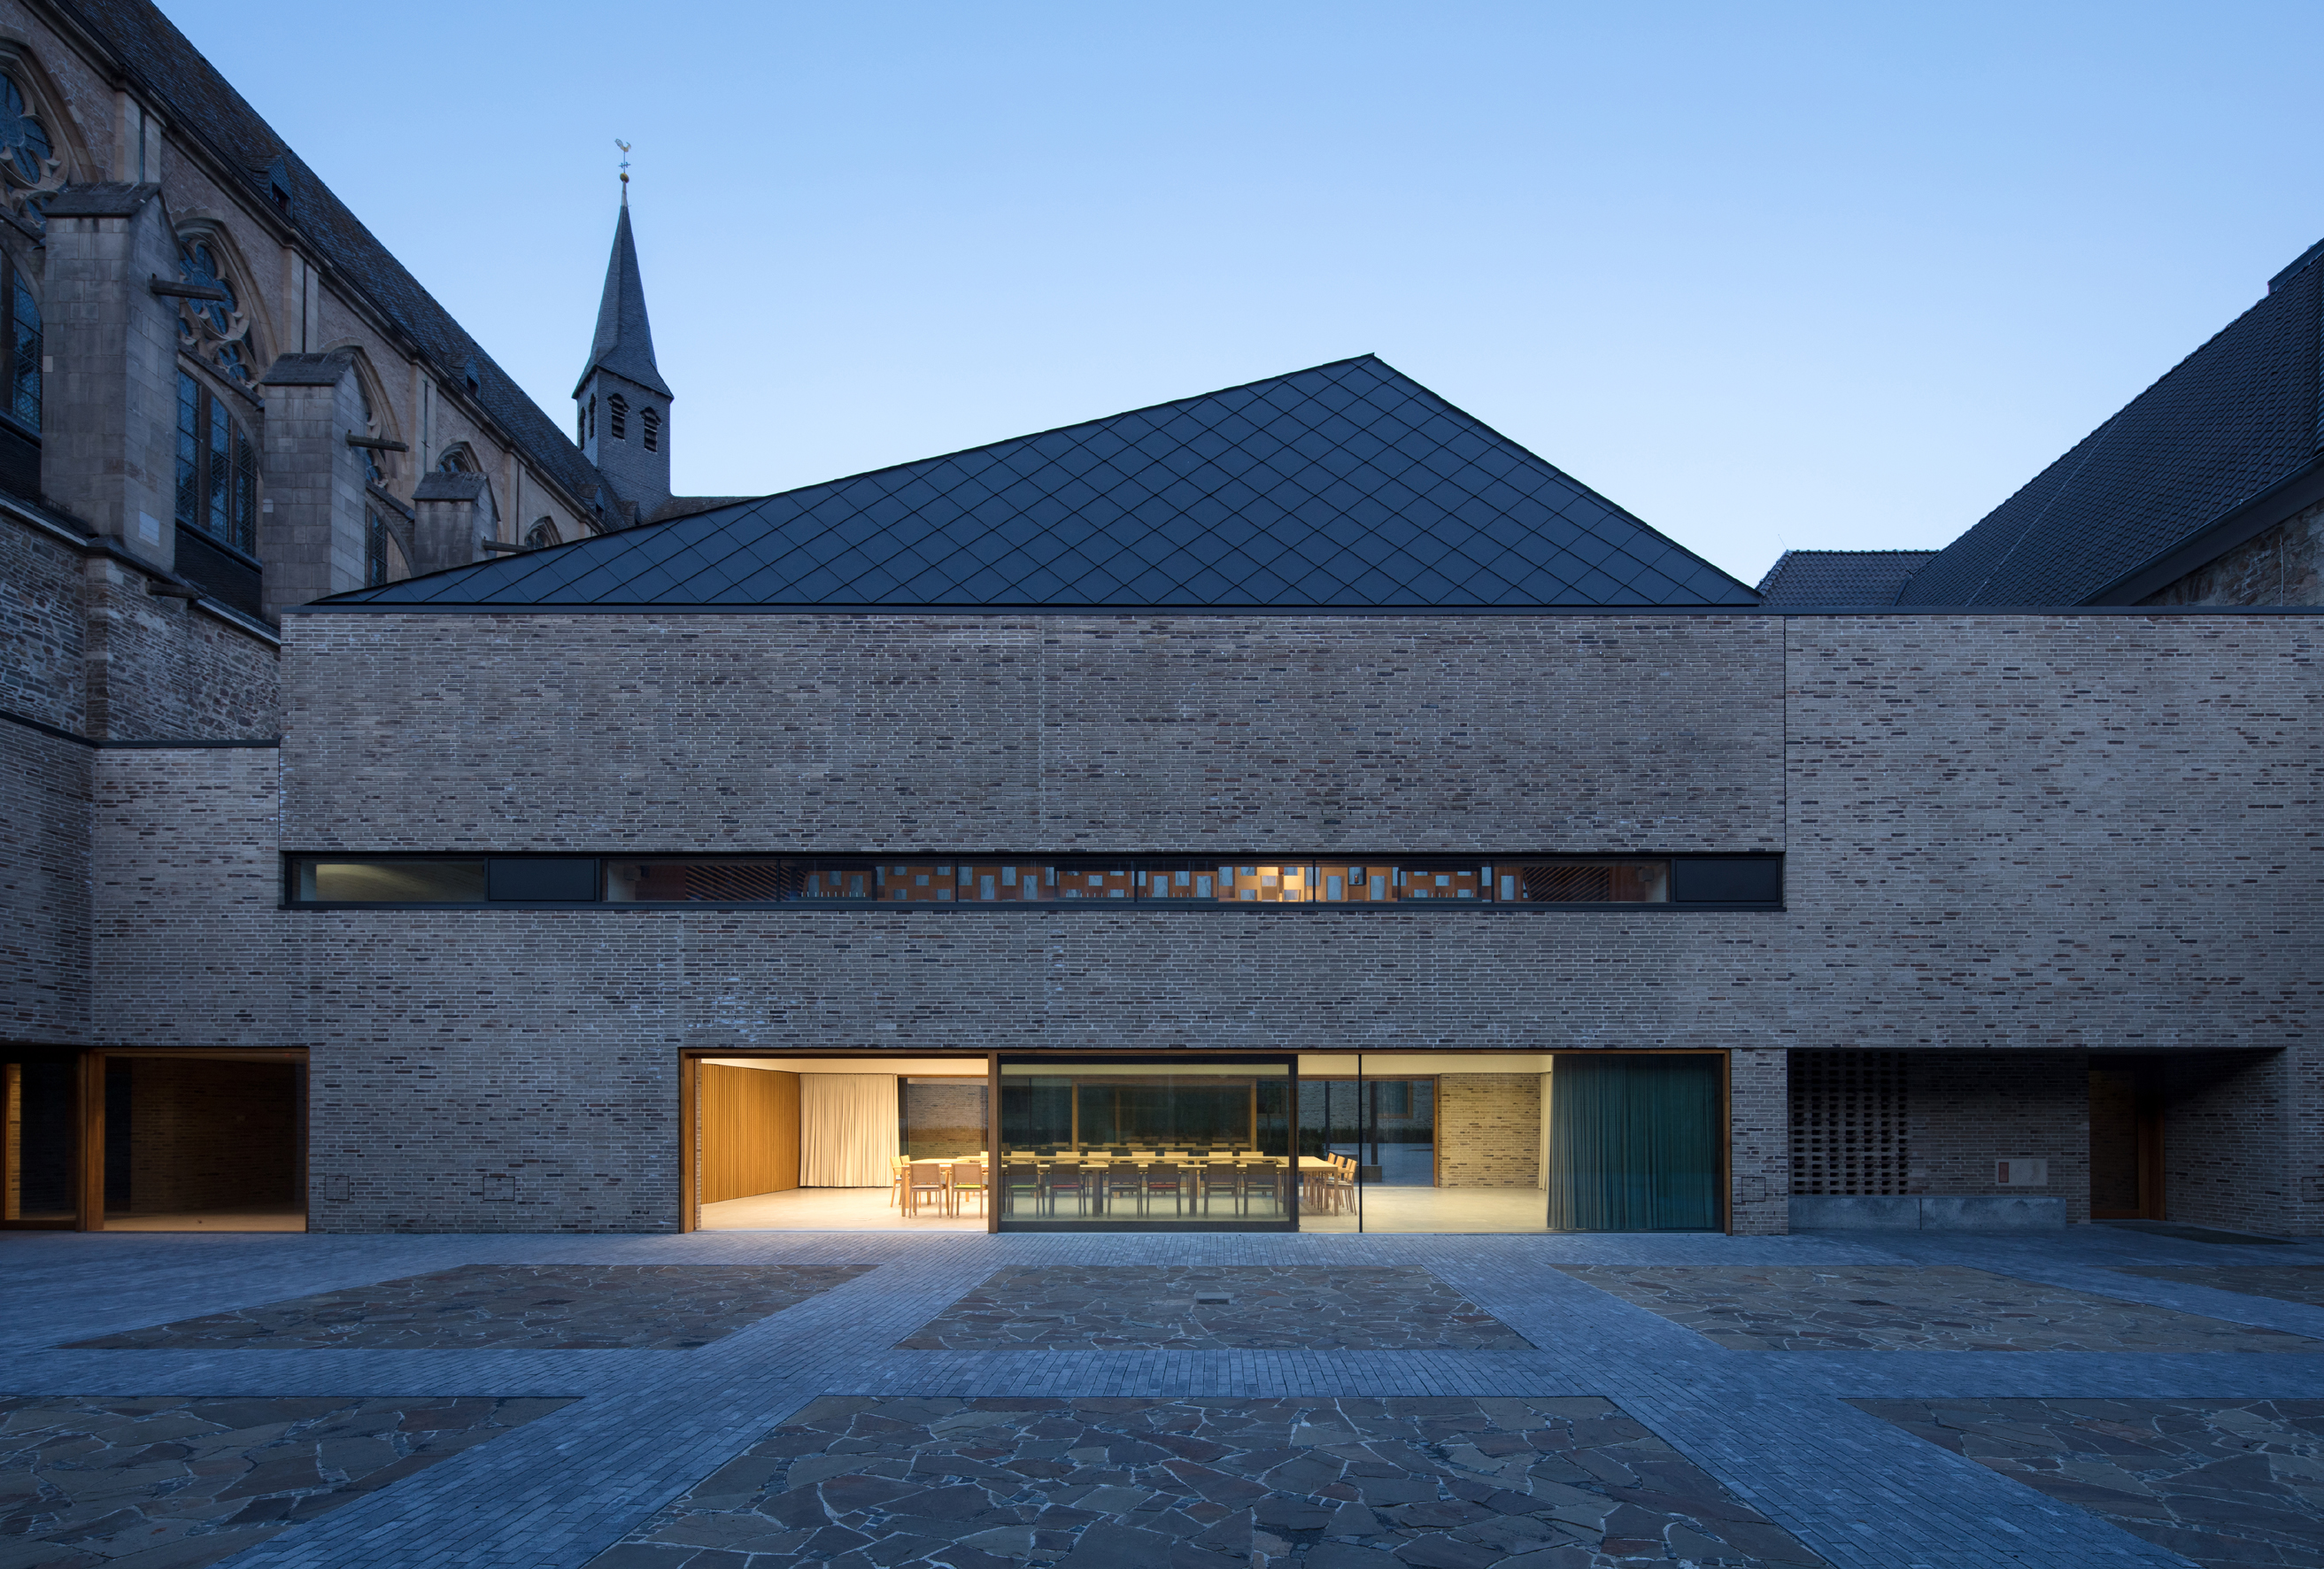 Architektur Köln pressedownload kap 2017 kölner architekturpreis kap